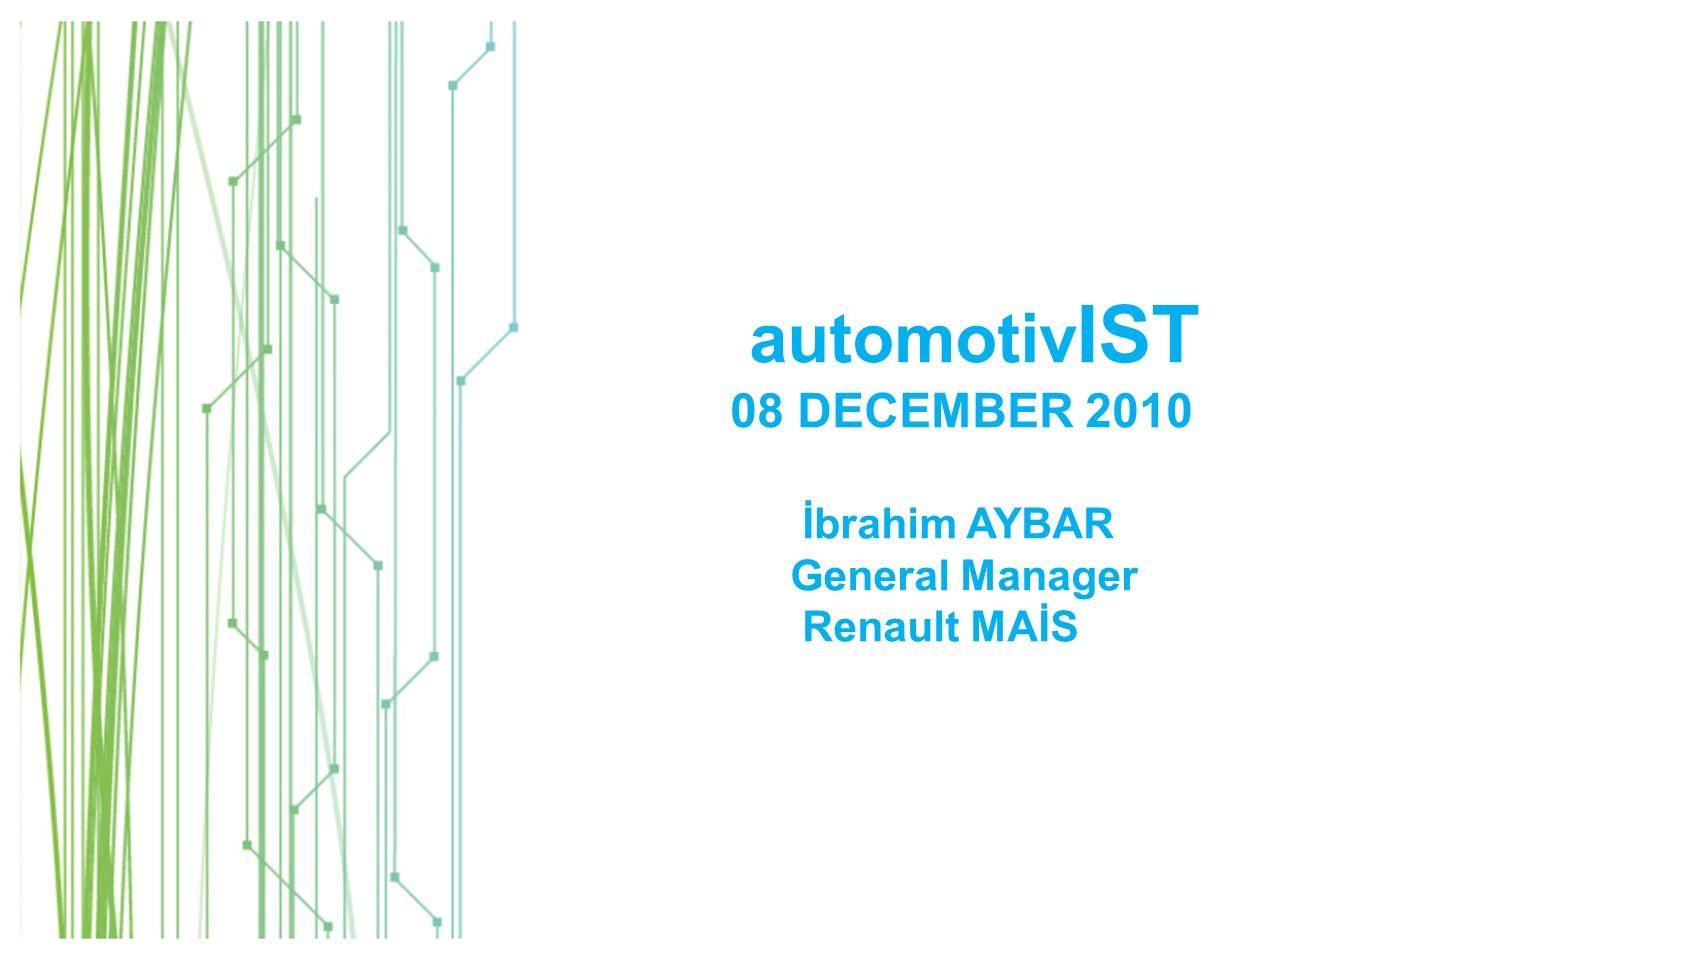 automotiv IST 08 DECEMBER 2010 İbrahim AYBAR General Manager Renault MAİS